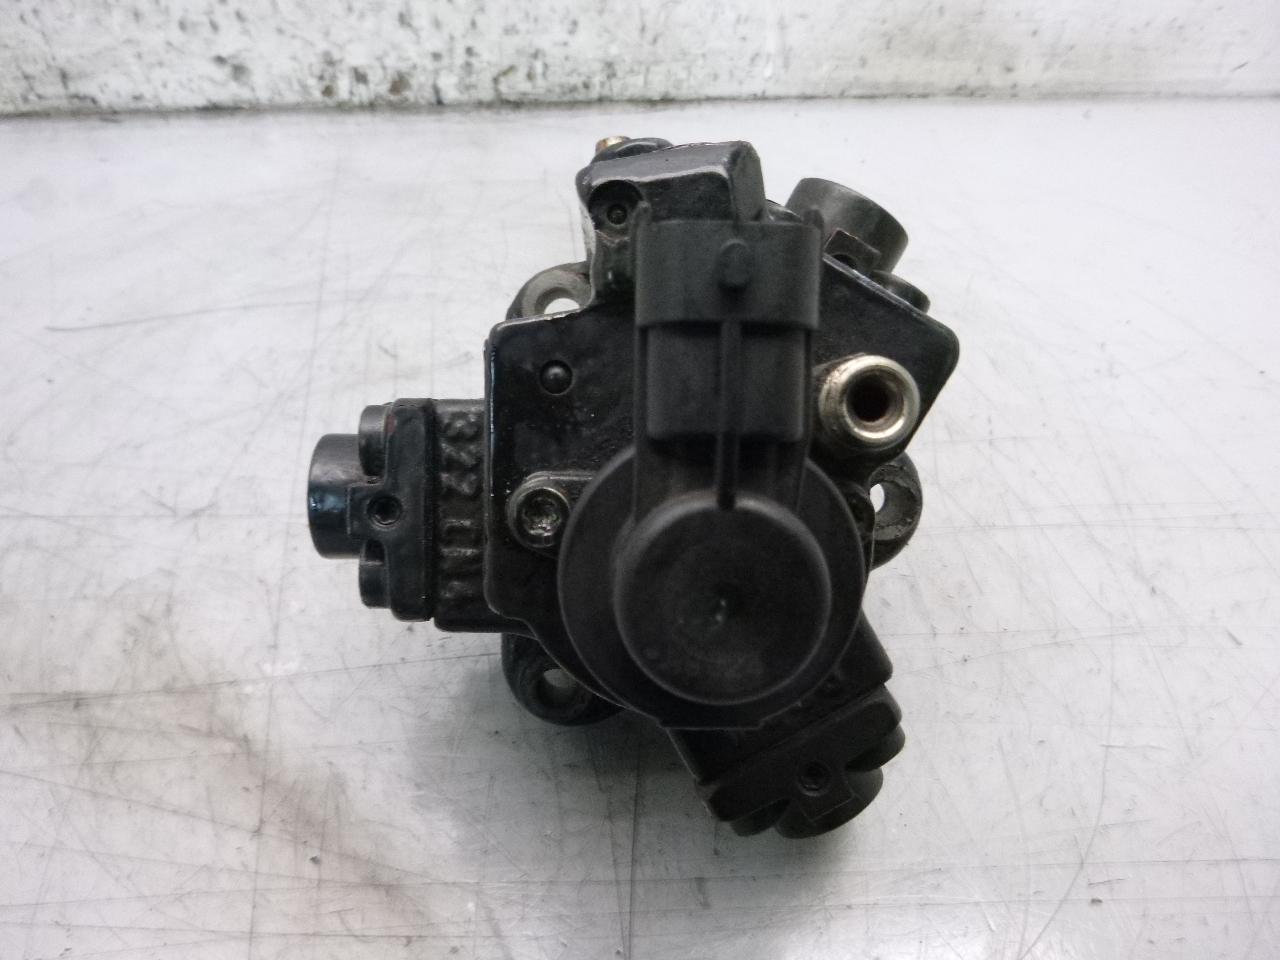 Hochdruckpumpe Opel Saab Astra Signum Vectra Zafira 9-3 1,9 CDTI Z19DT 55204600